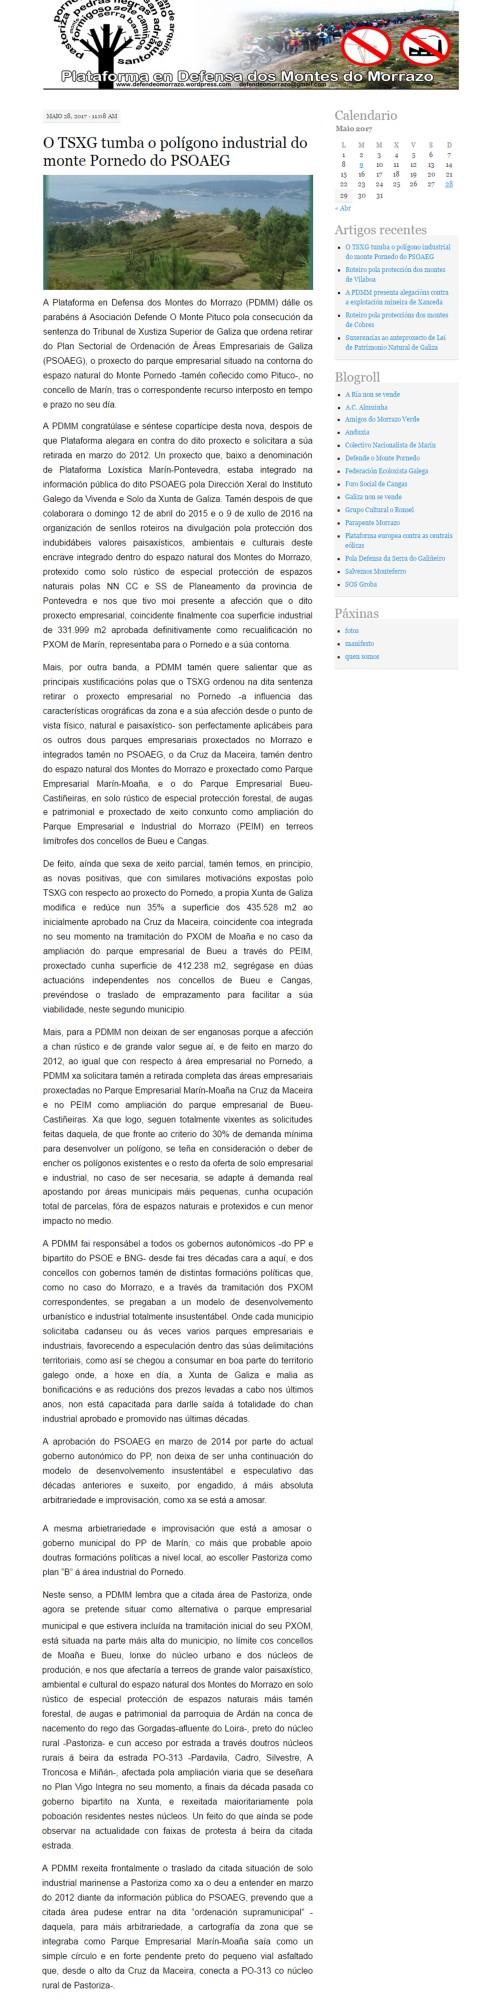 Plataforma Montes do Morrazo